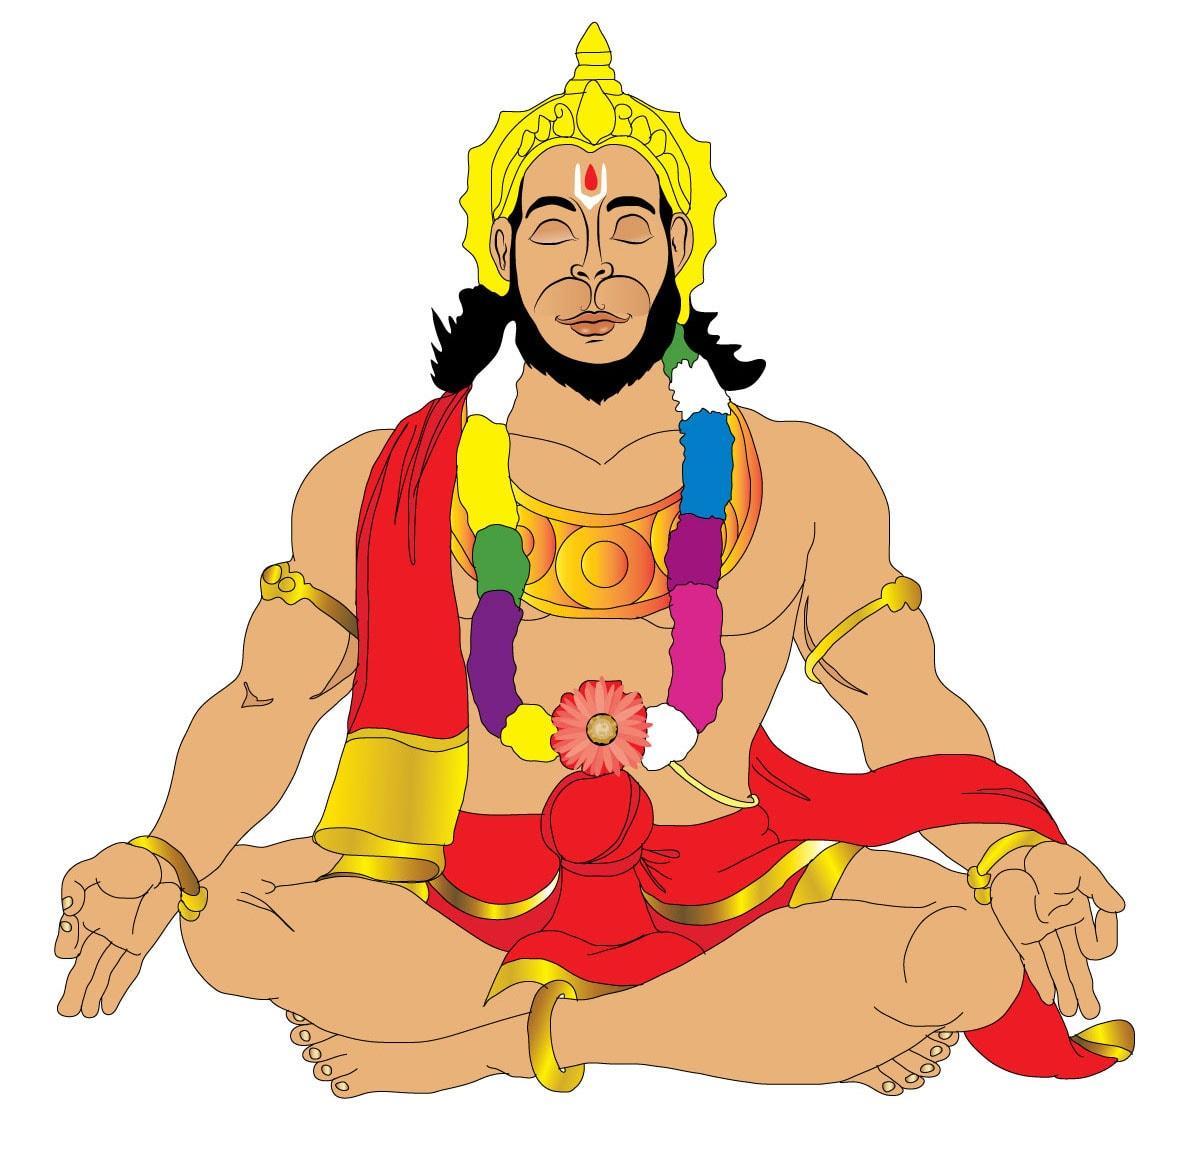 Hd wallpaper hanuman -  Hanuman Animated Wallpaper Hd Download